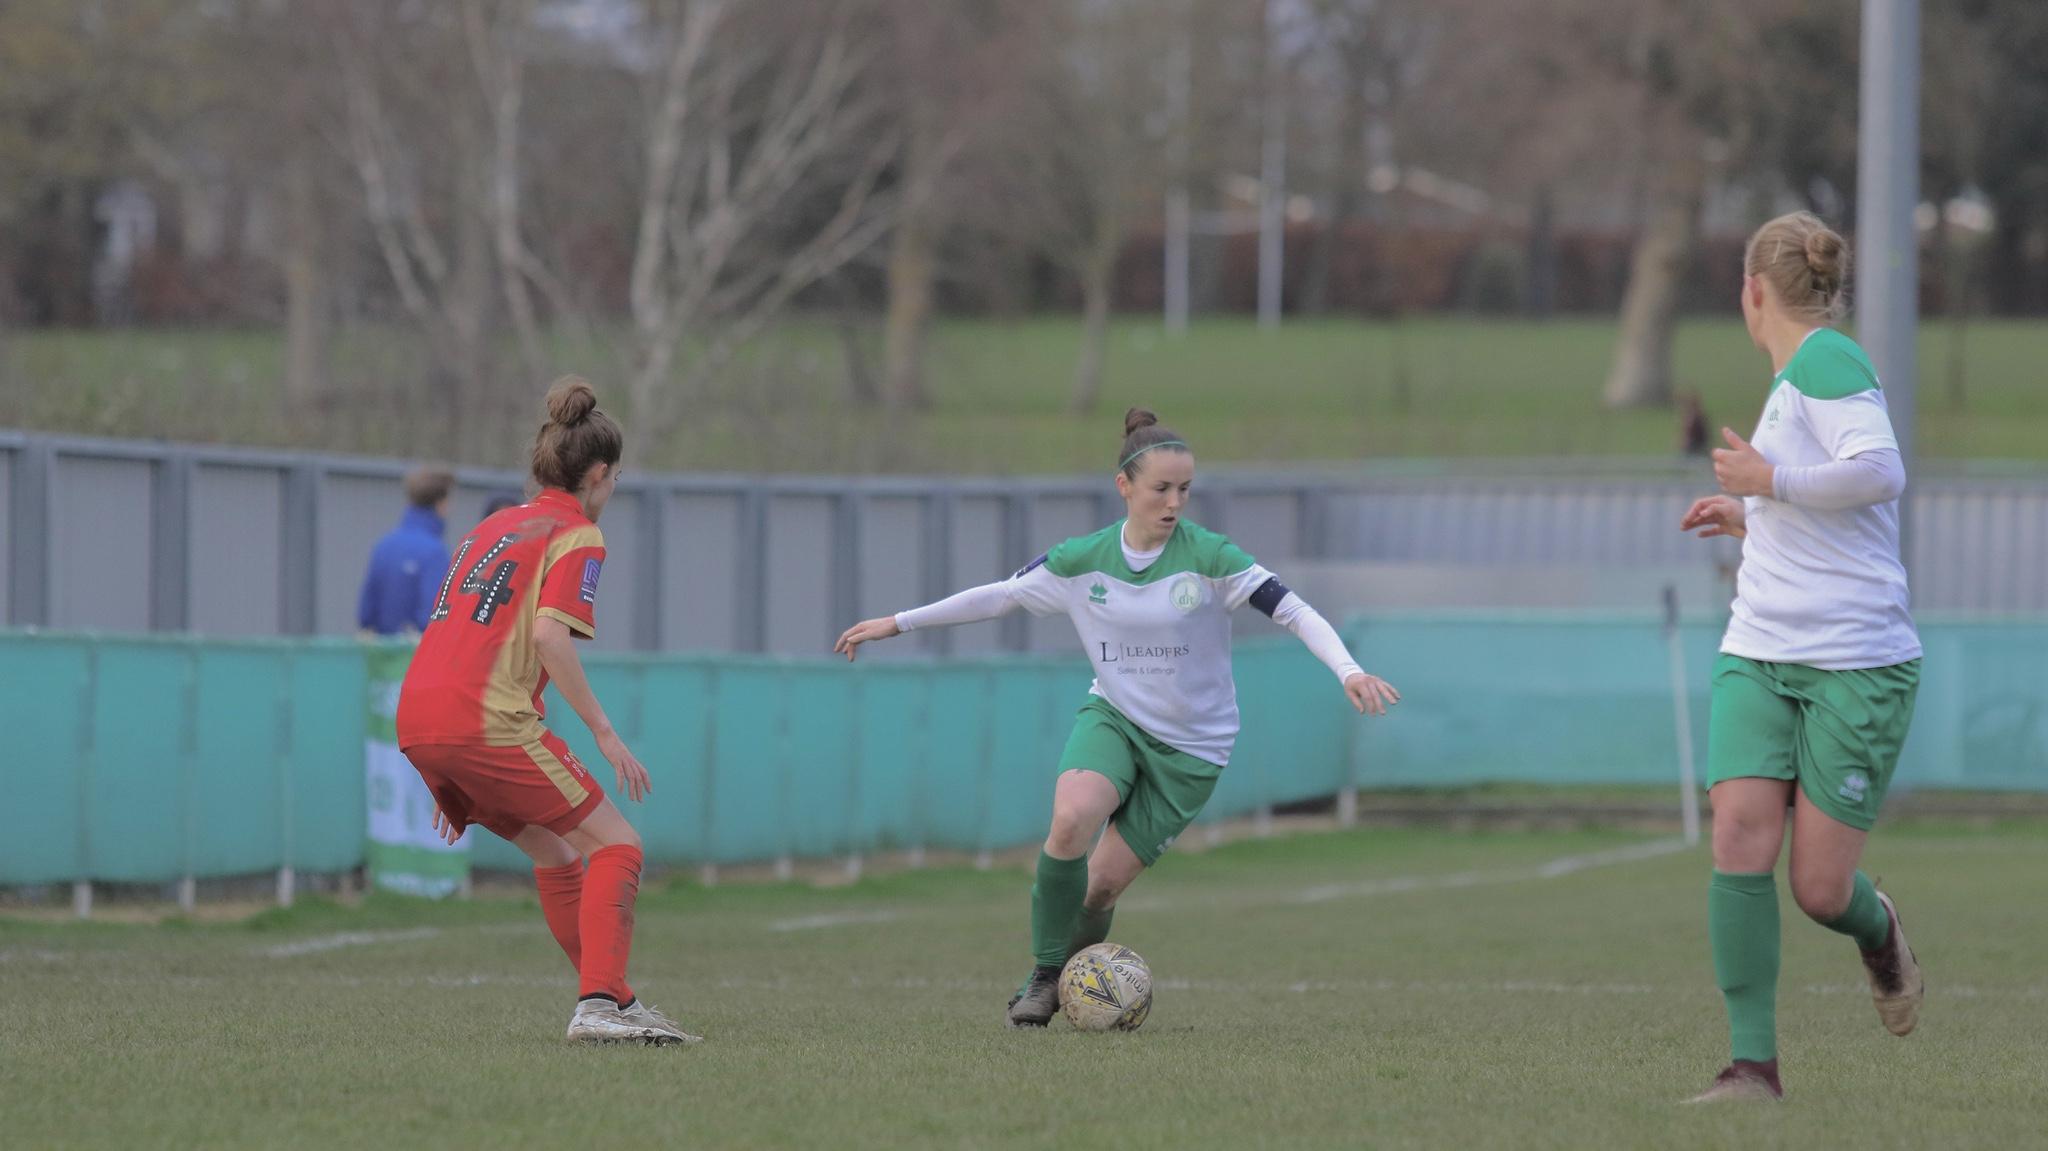 Lauren Cheshire during Chichester City versus MK Dons. Photo: Sheena Booker